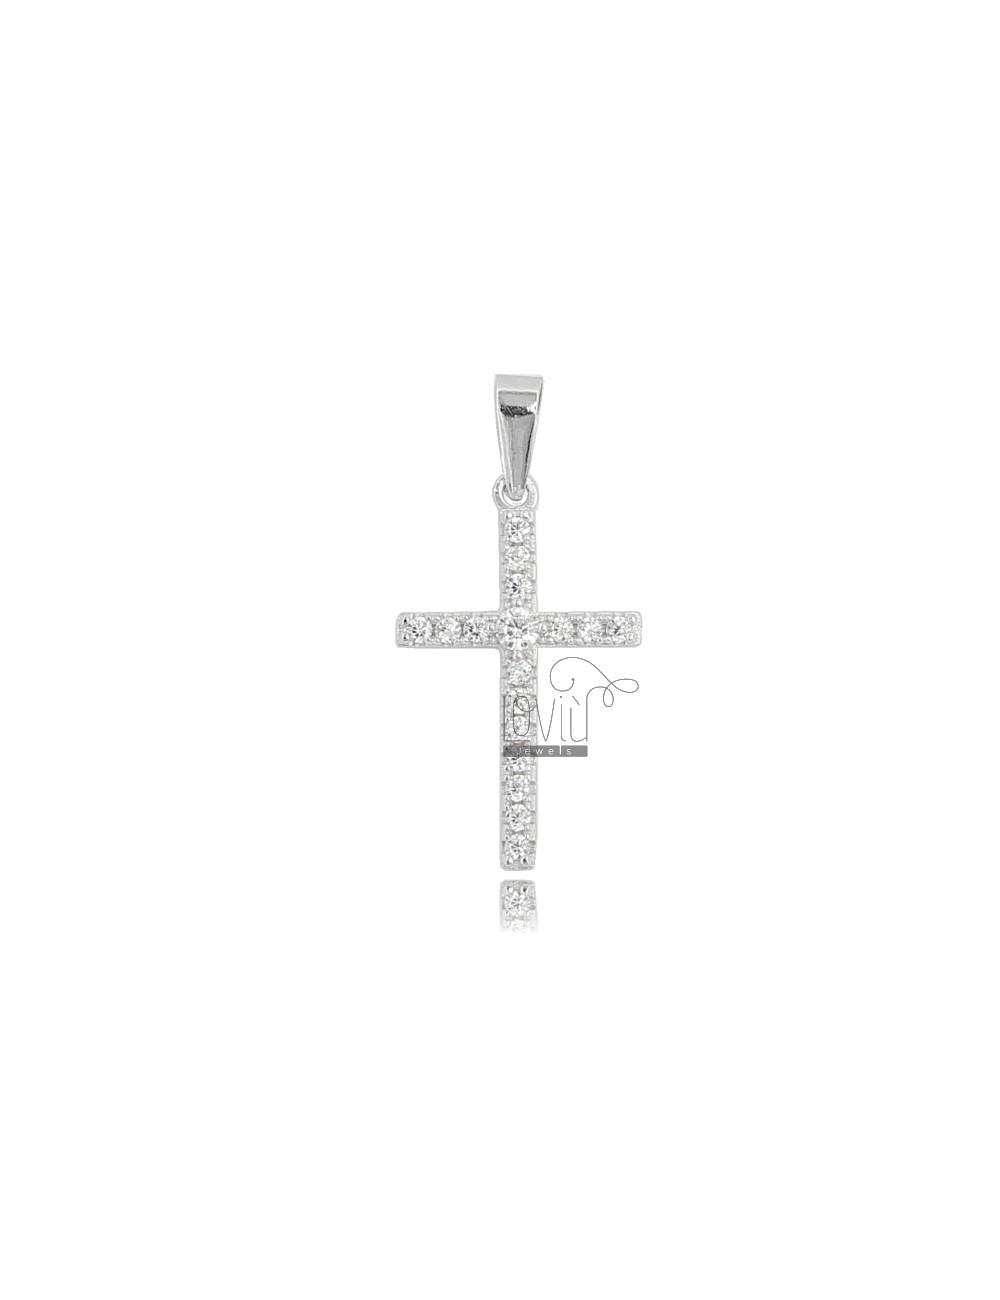 CROSS PENDANT 22X14 MM SILVER RHODIUM TIT 925 AND WHITE ZIRCONIA